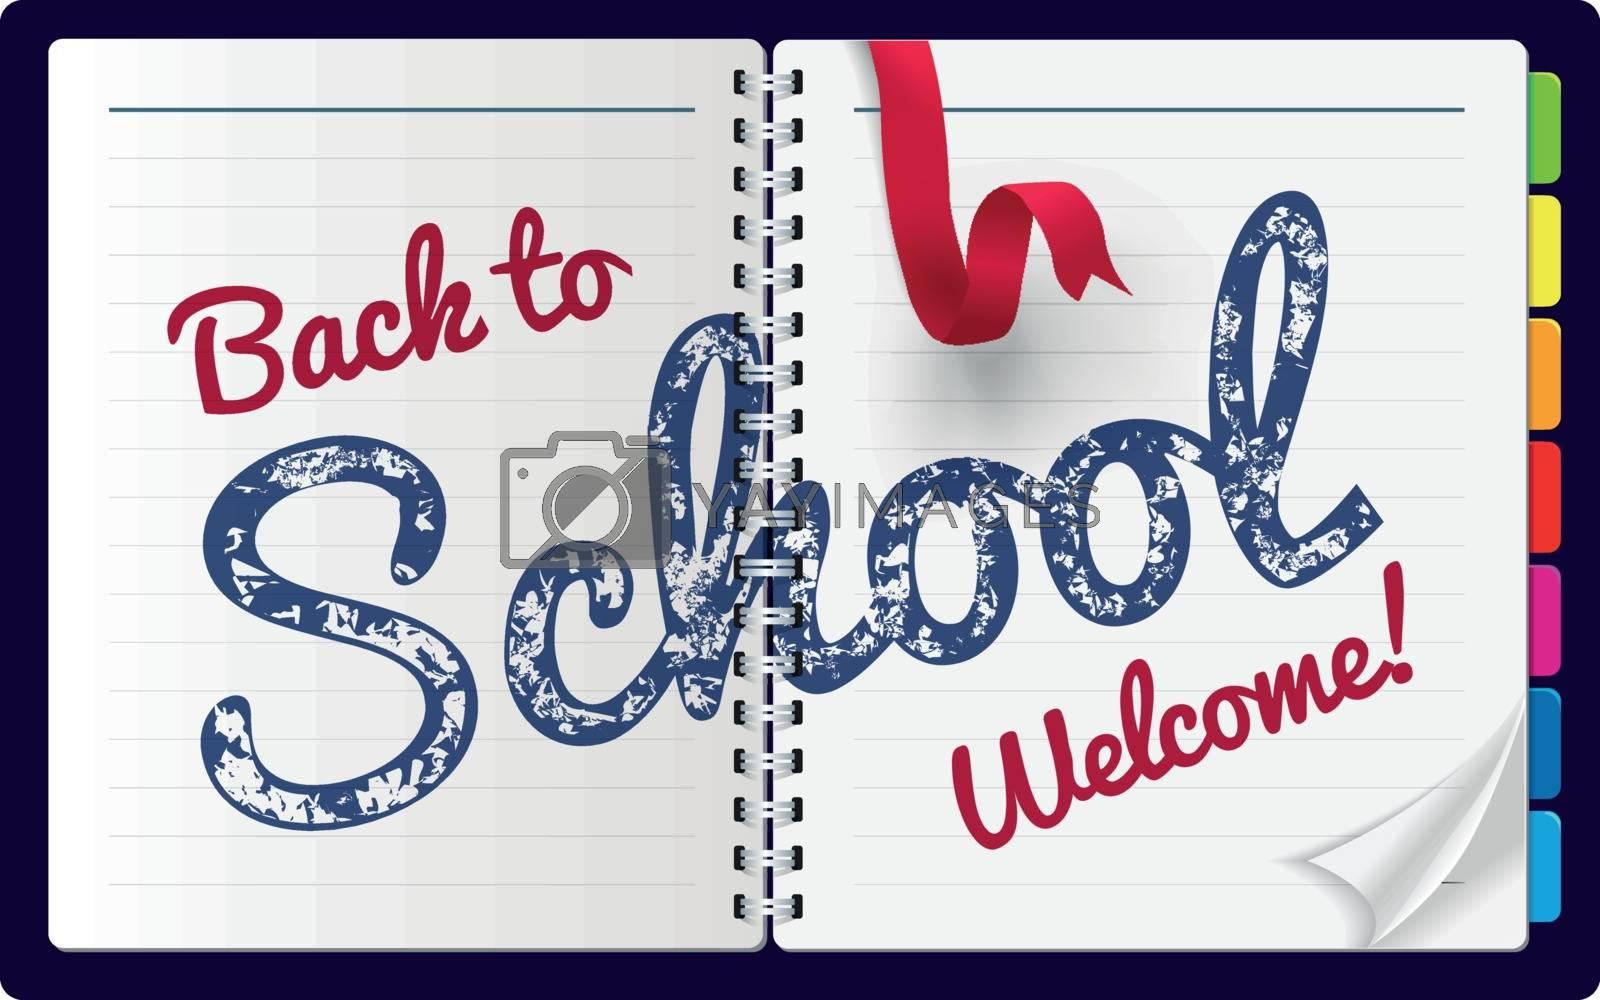 Back to school Illustration on a notepad background. Vector illustration